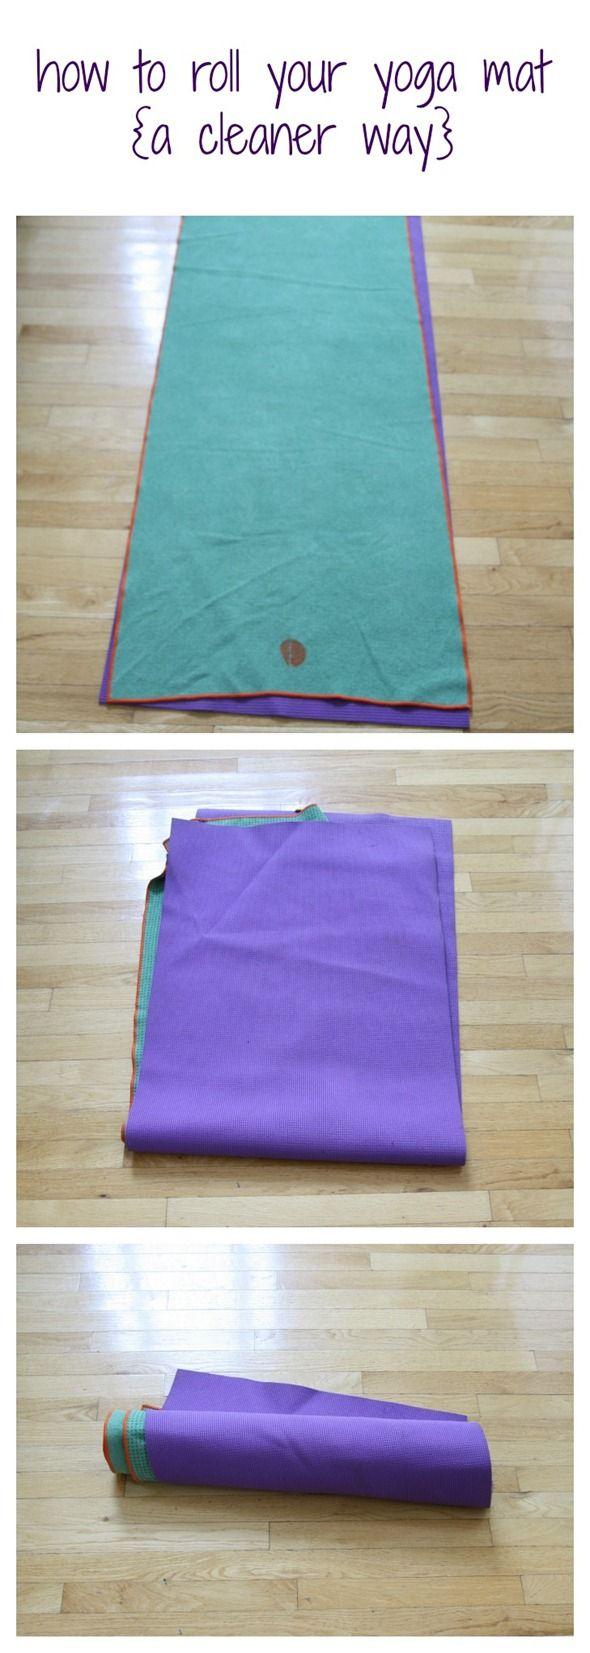 You Ll Never Roll Your Yoga Mat The Same Way Again Yoga Mats Best Yoga Meditation Yoga Mat